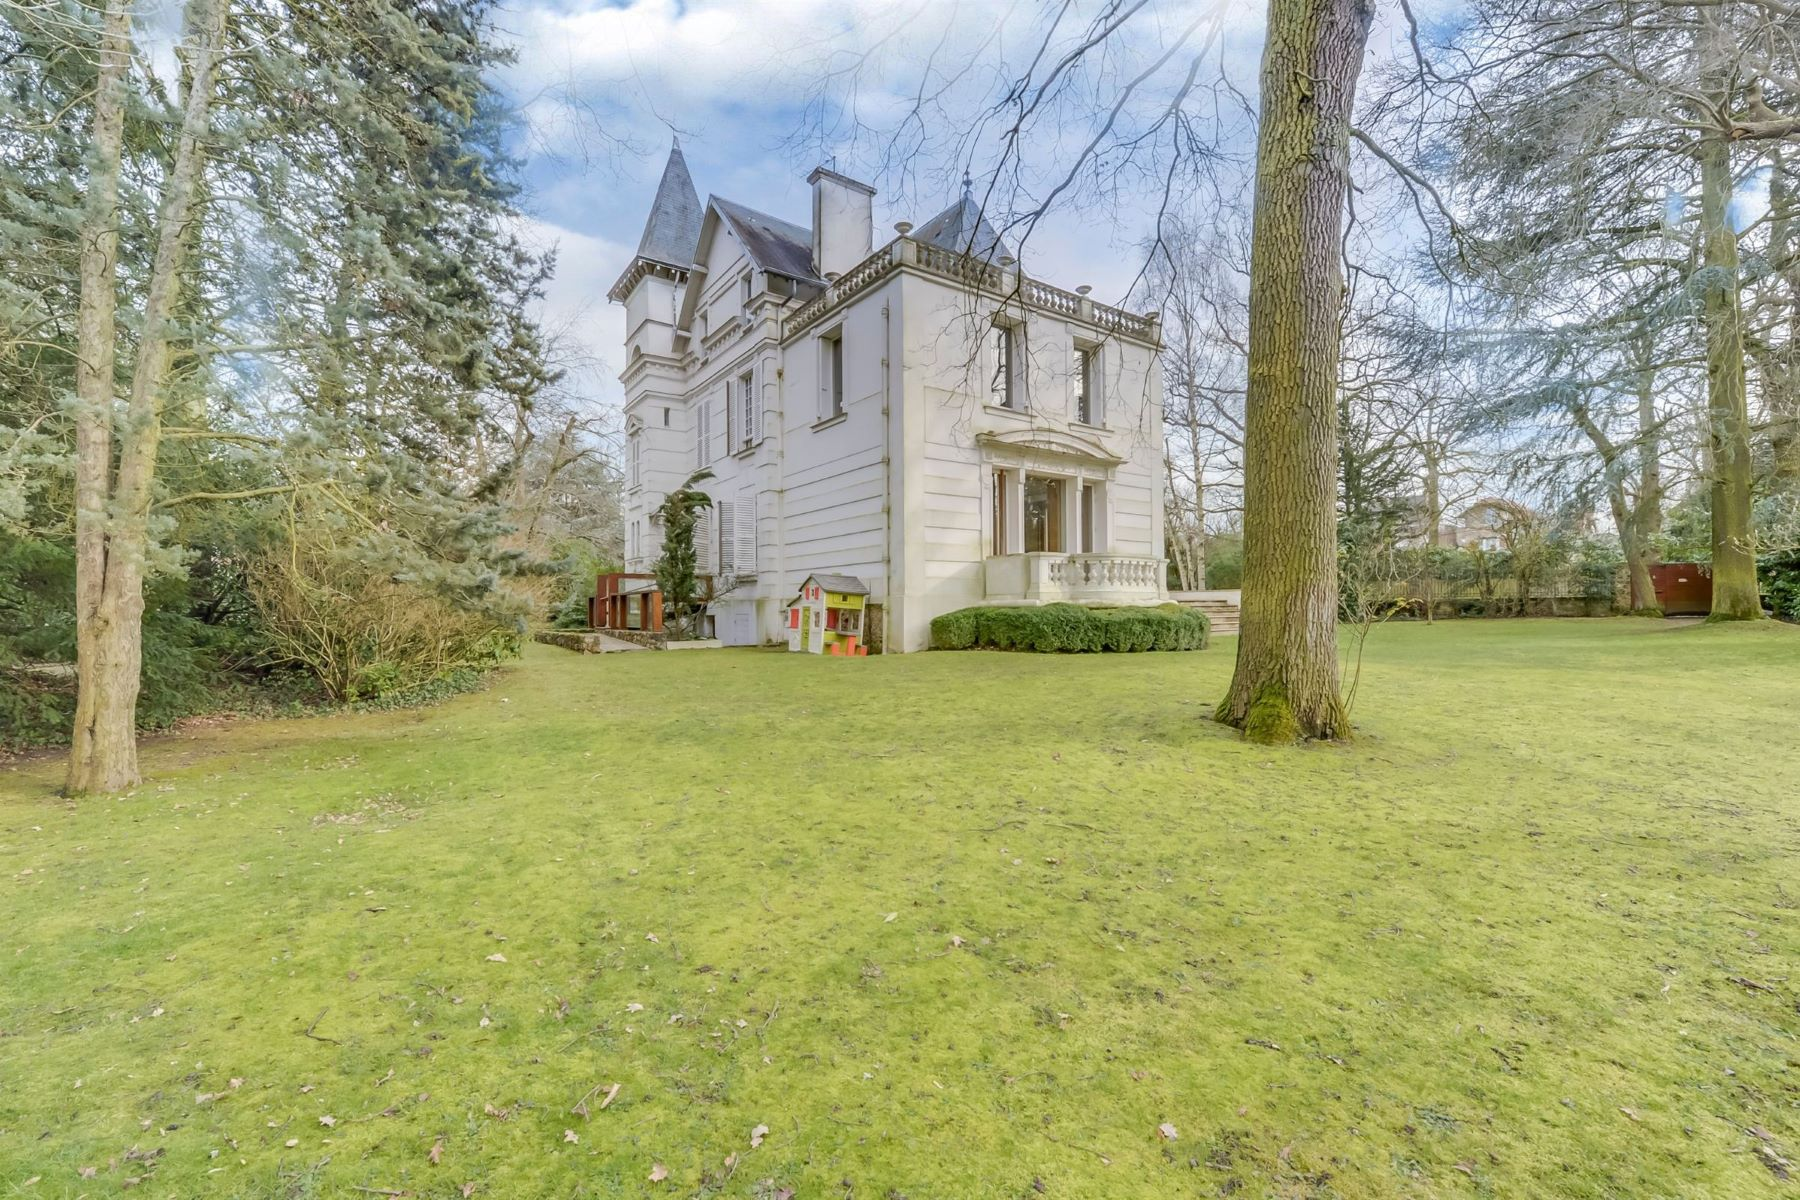 Single Family Home for Sale at Elegant 450 sq.m private mansion for sale Vaucresson with superb park Vaucresson, Ile-De-France, 92420 France